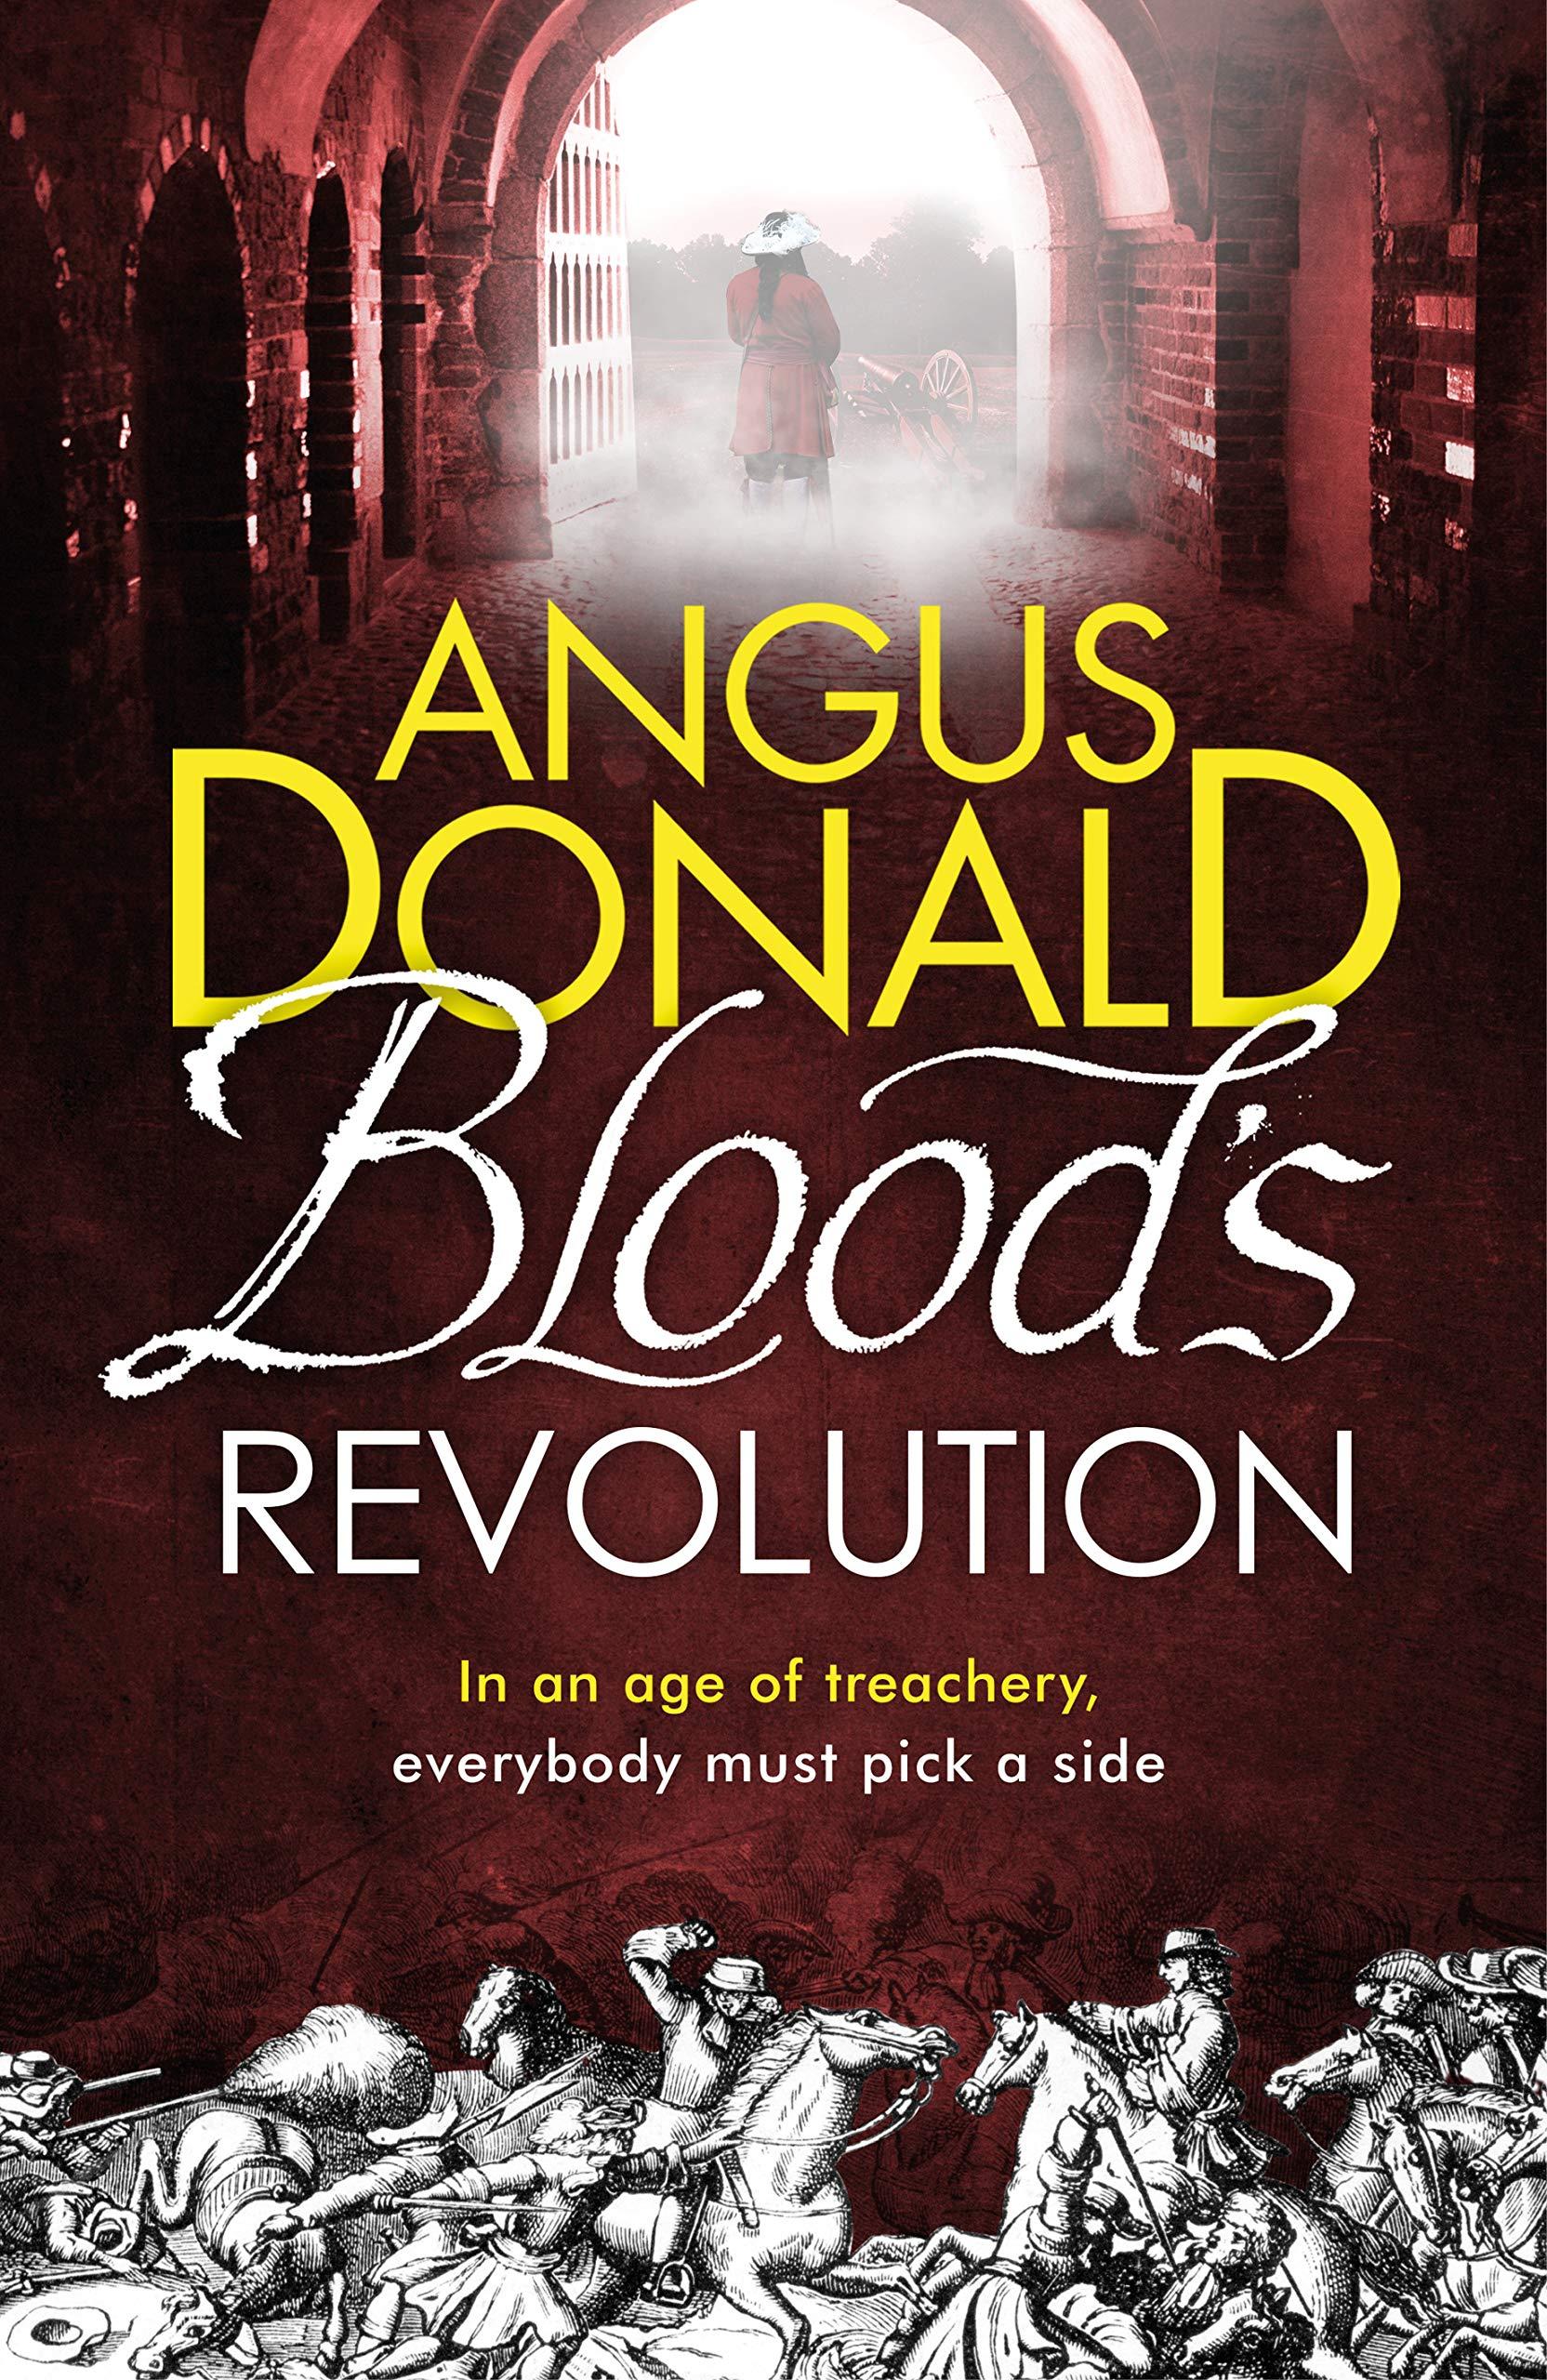 Blood's Revolution (Holcroft Blood 2): Amazon.co.uk: Angus Donald:  9781785764042: Books